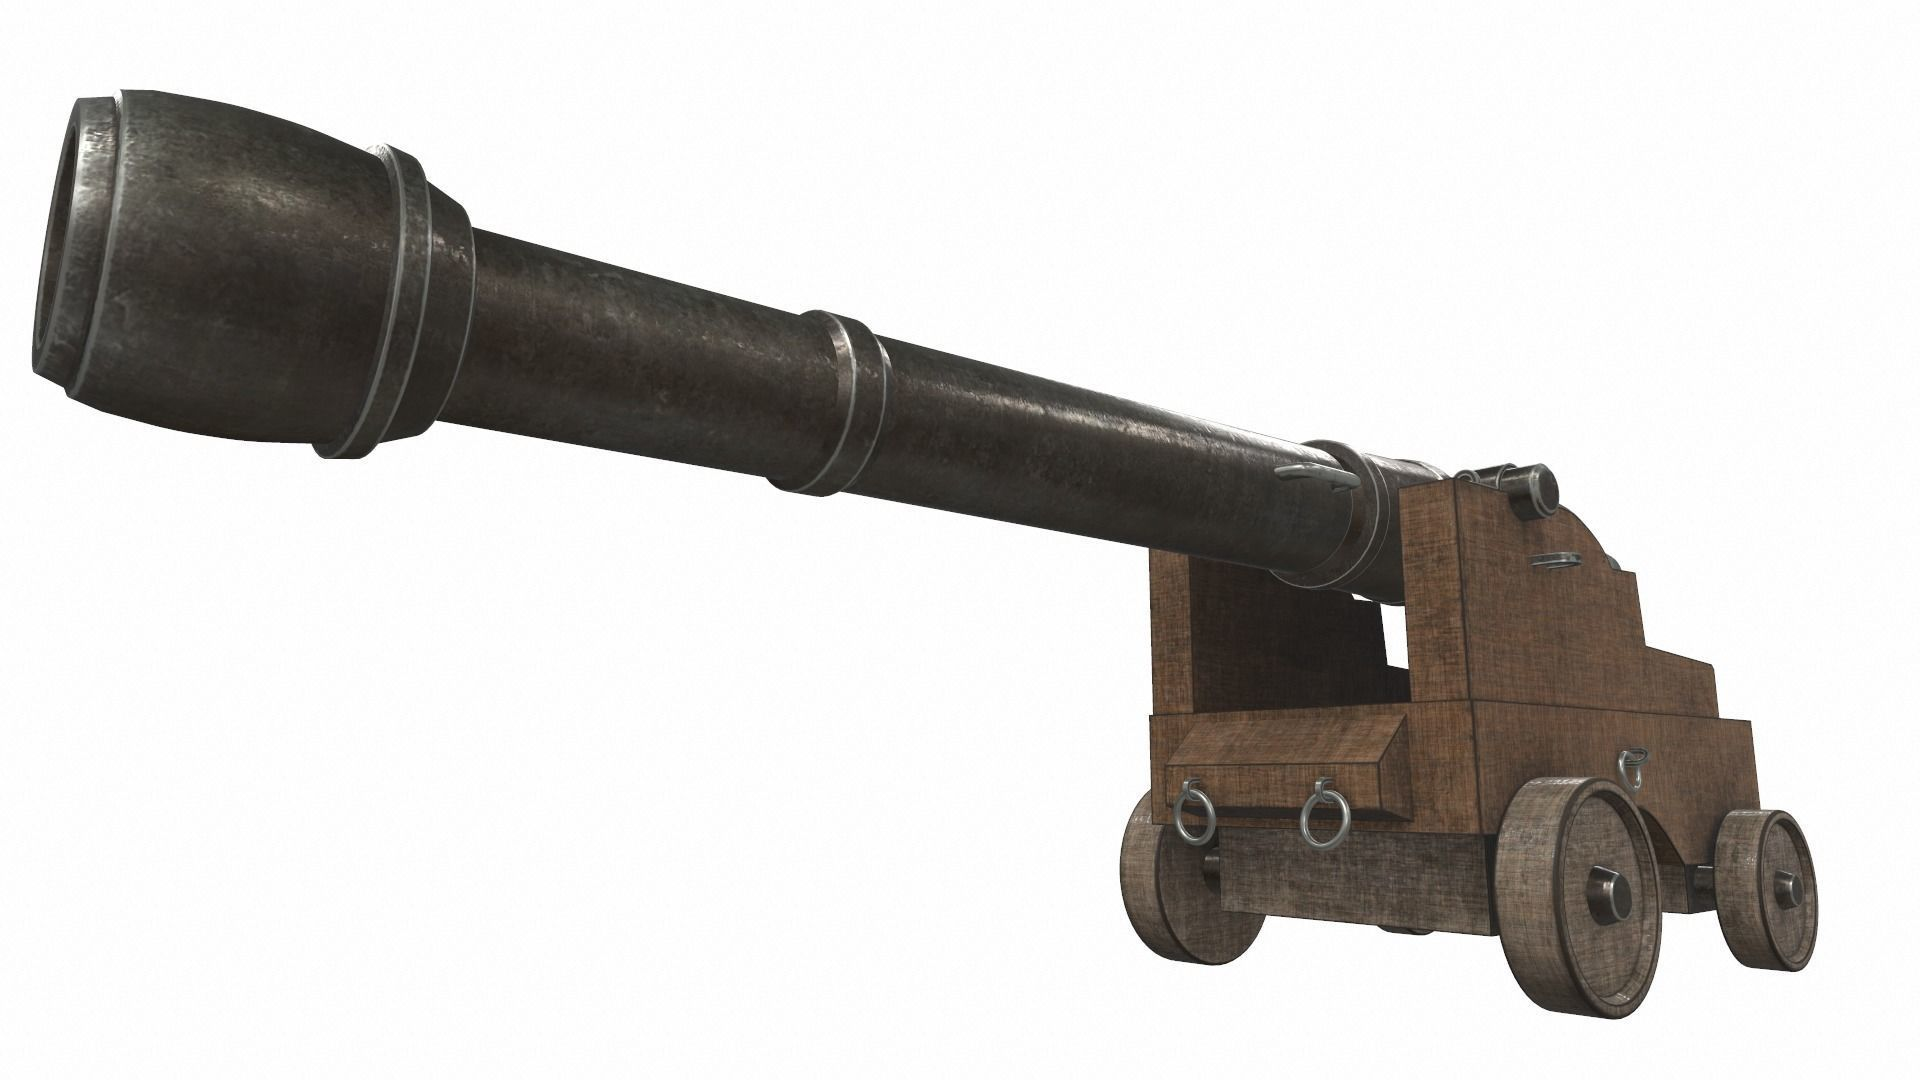 Cannon 8